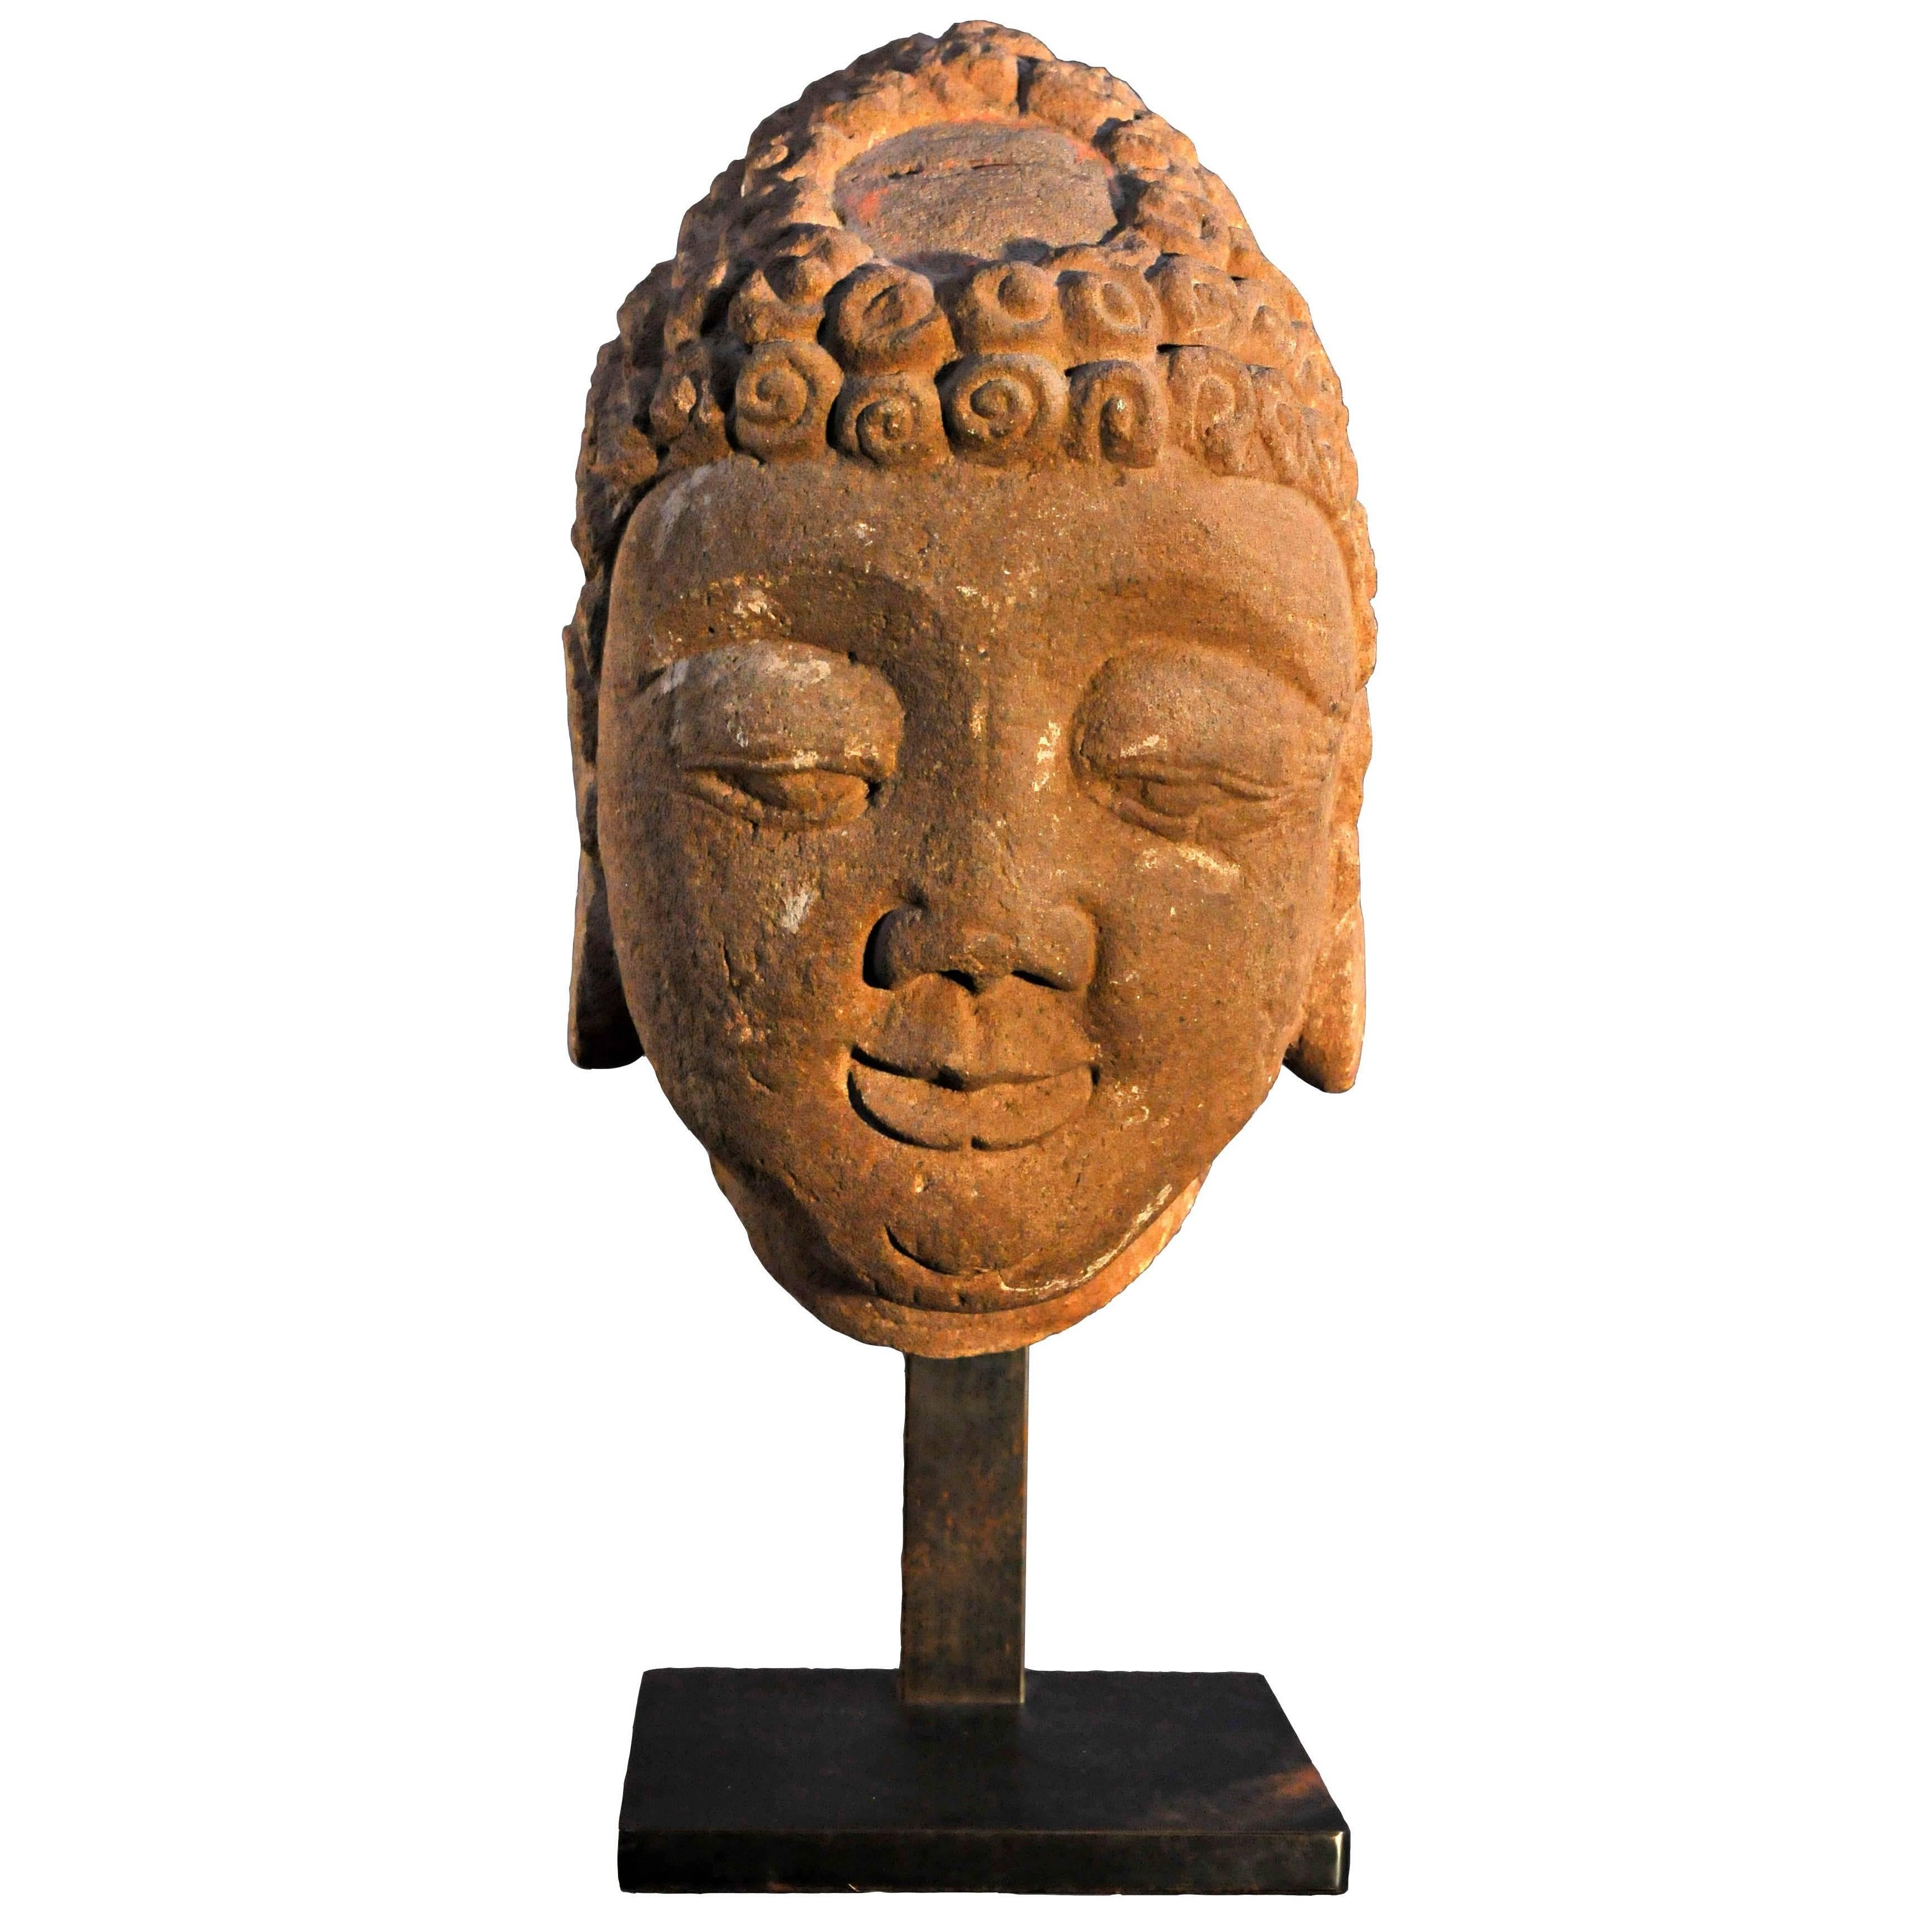 Late 14th Century, Stone Buddha Head, YuanDynasty, Art of China